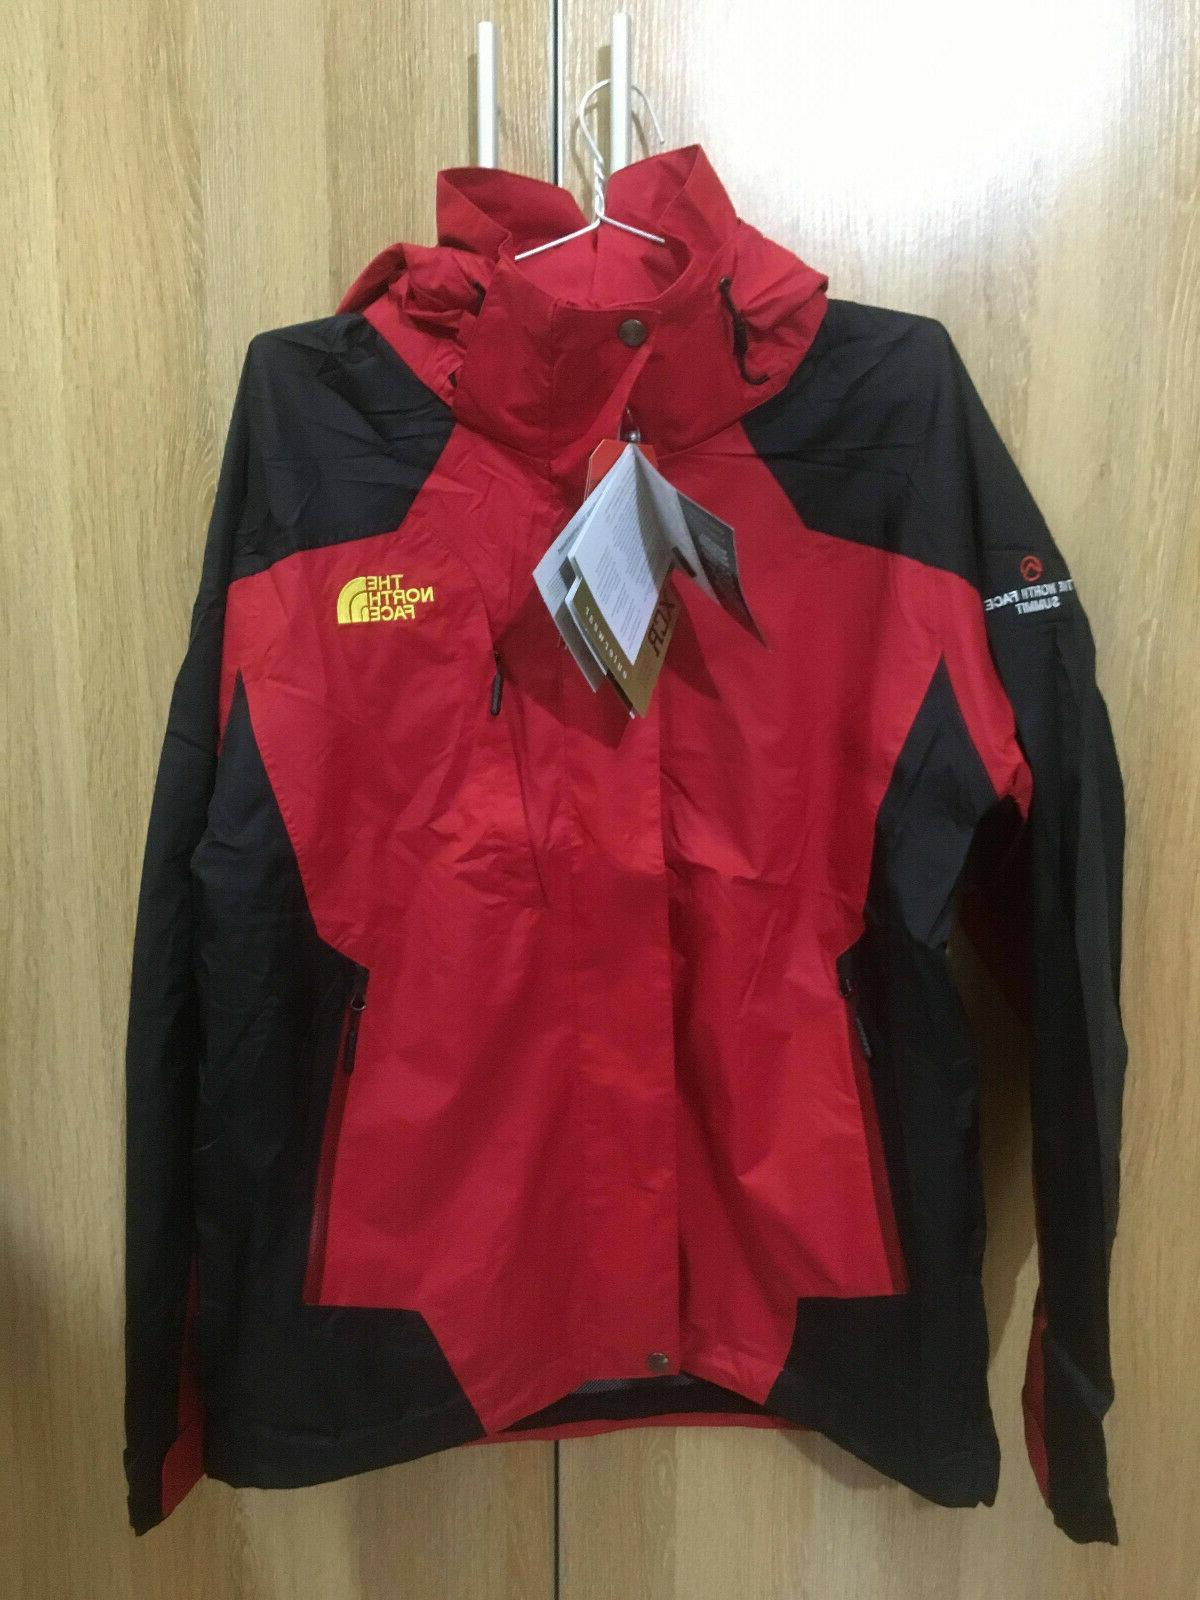 NEW Mens The North Face Rainwear Red Small Goretex Jacket